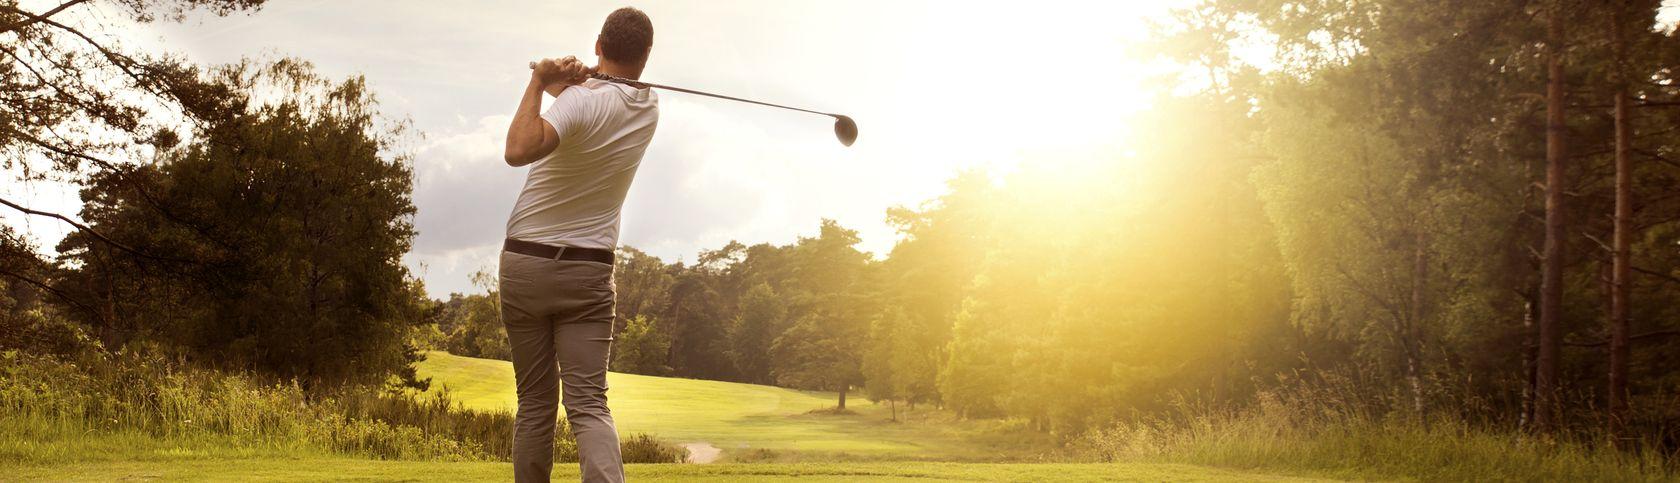 HART Сharity Golf Tournament